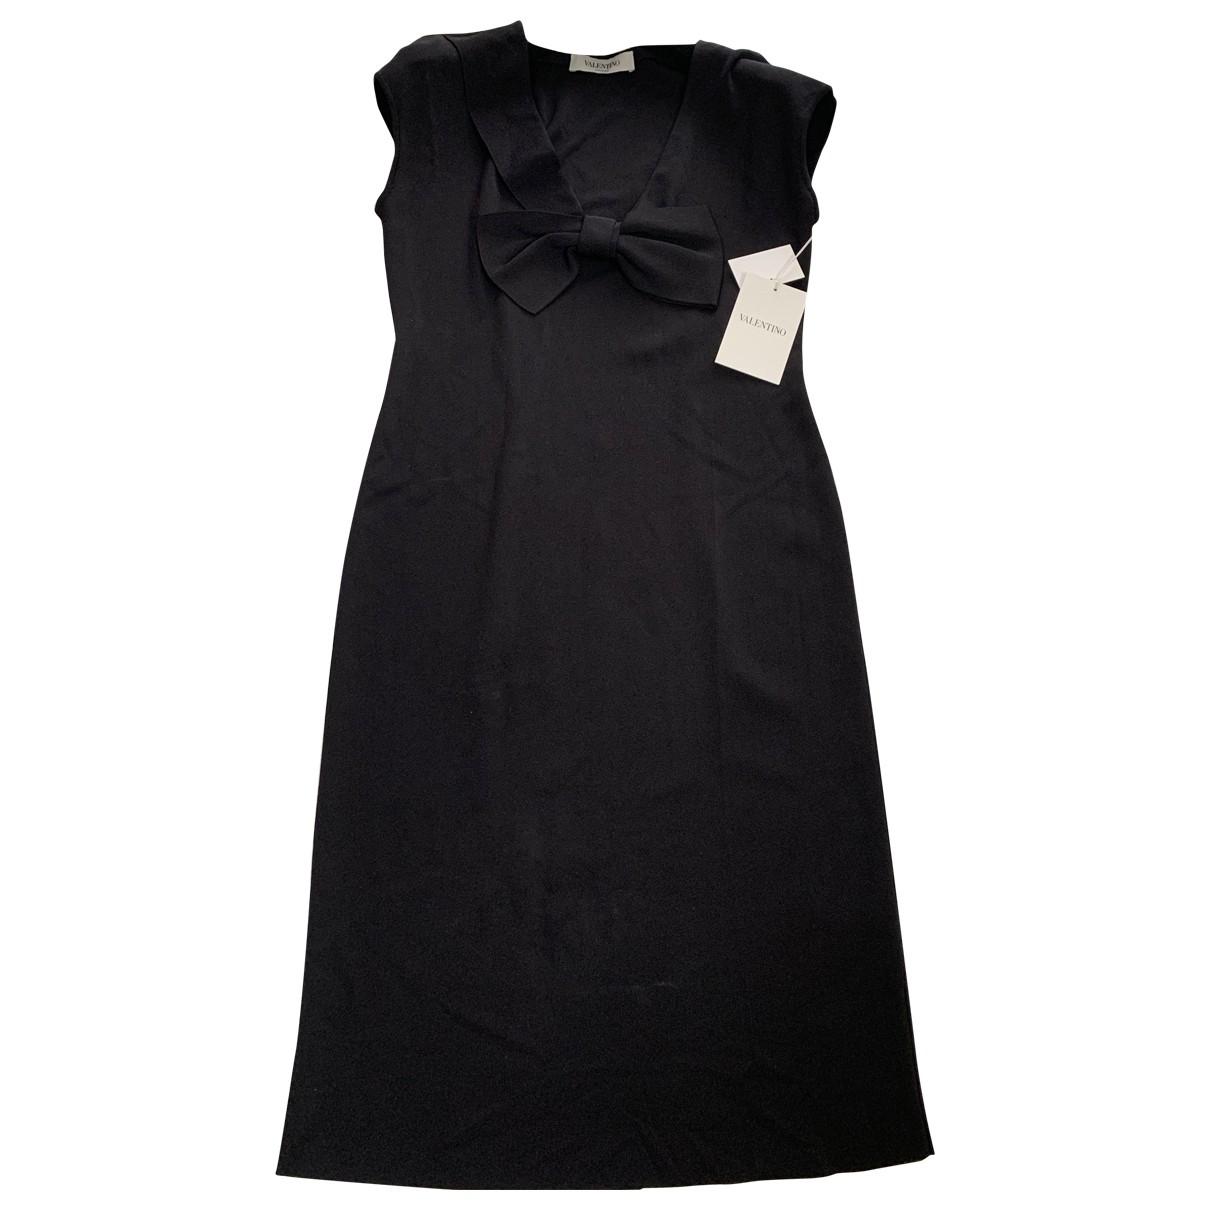 Valentino Garavani \N Black dress for Women L International